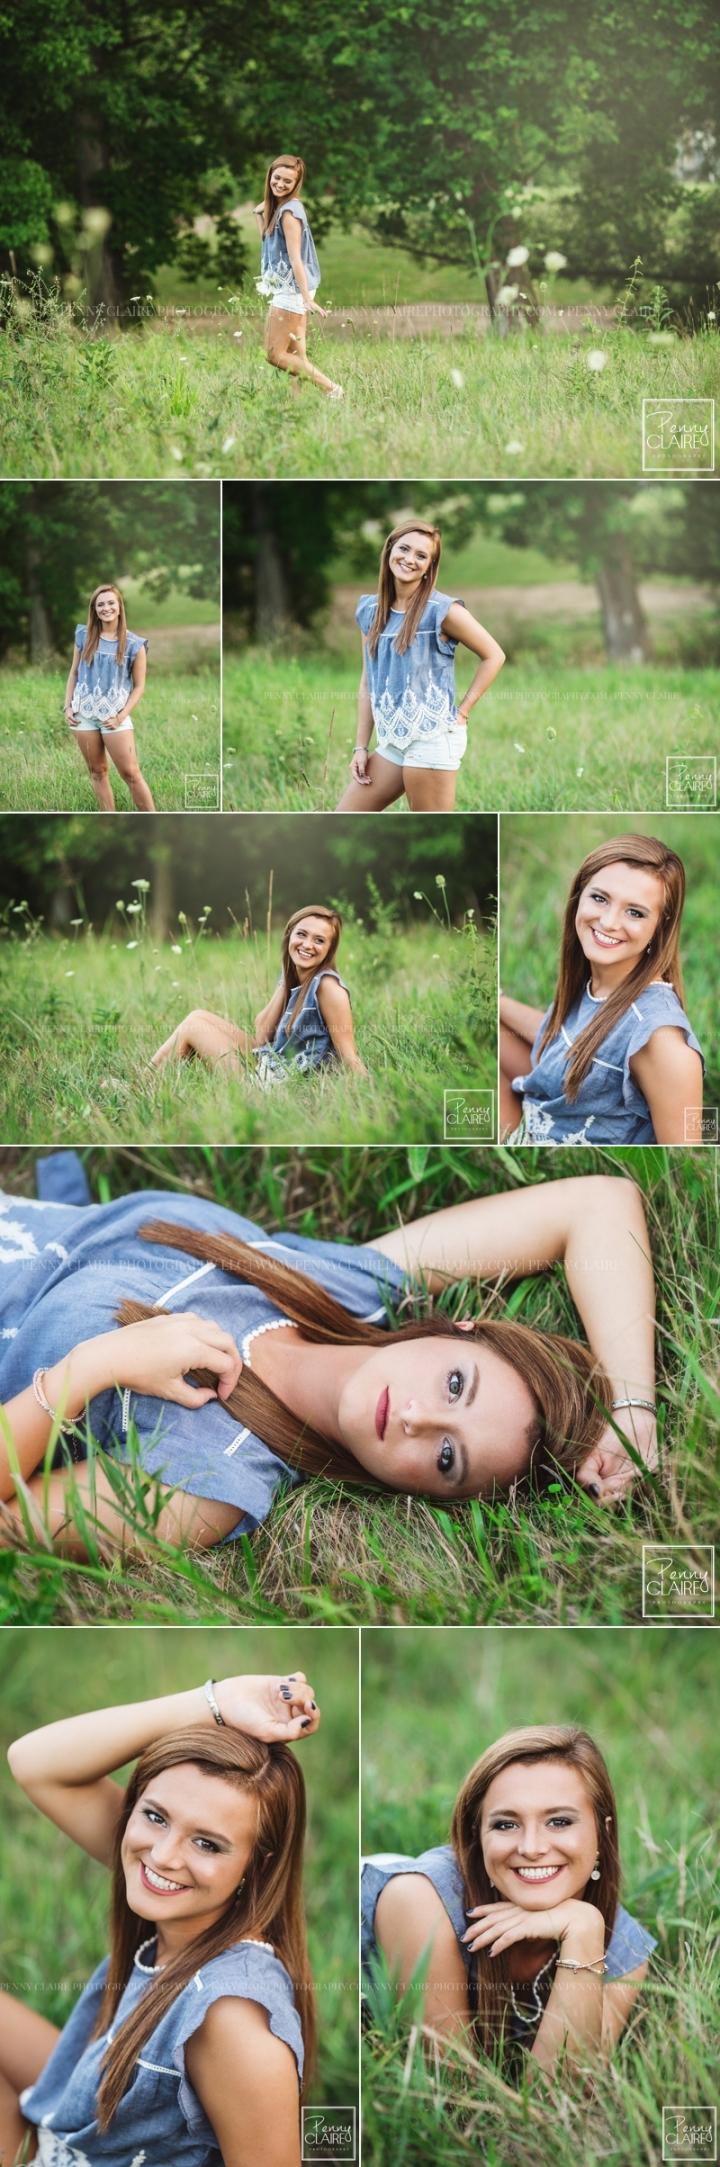 high-school-senior-photos-pennyclaire-4